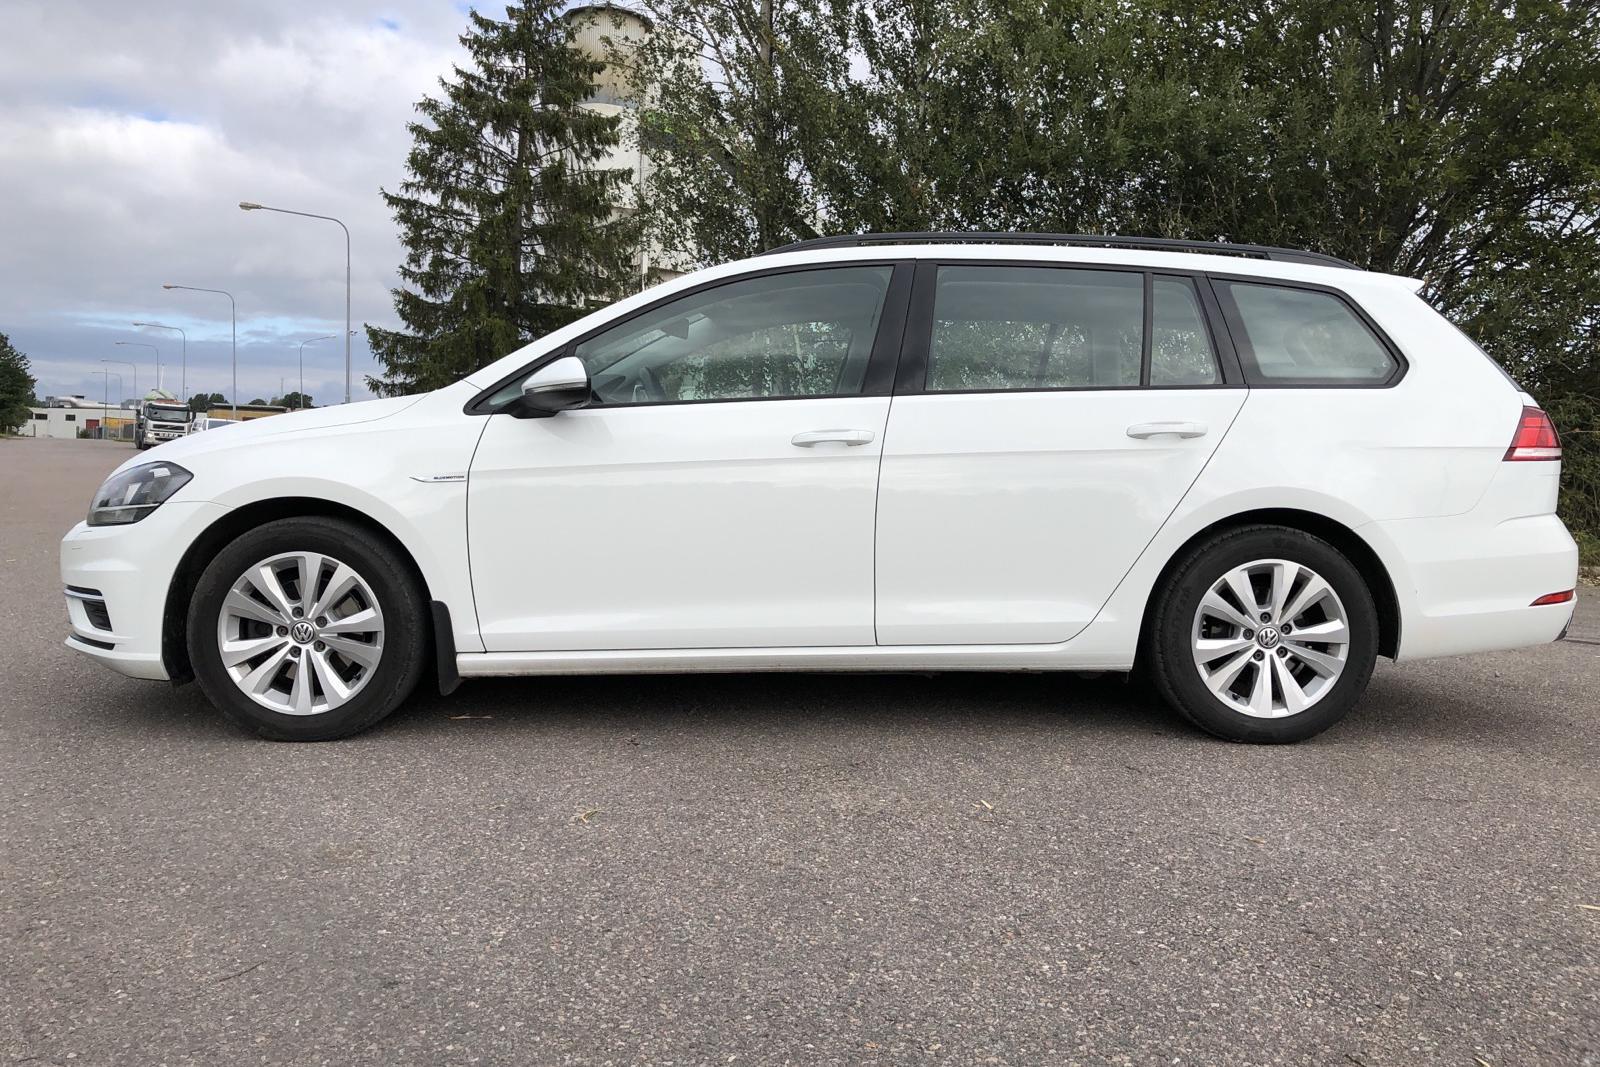 VW Golf VII 1.4 TGI BlueMotion Sportscombi (110hk) - 85 300 km - Manual - white - 2018